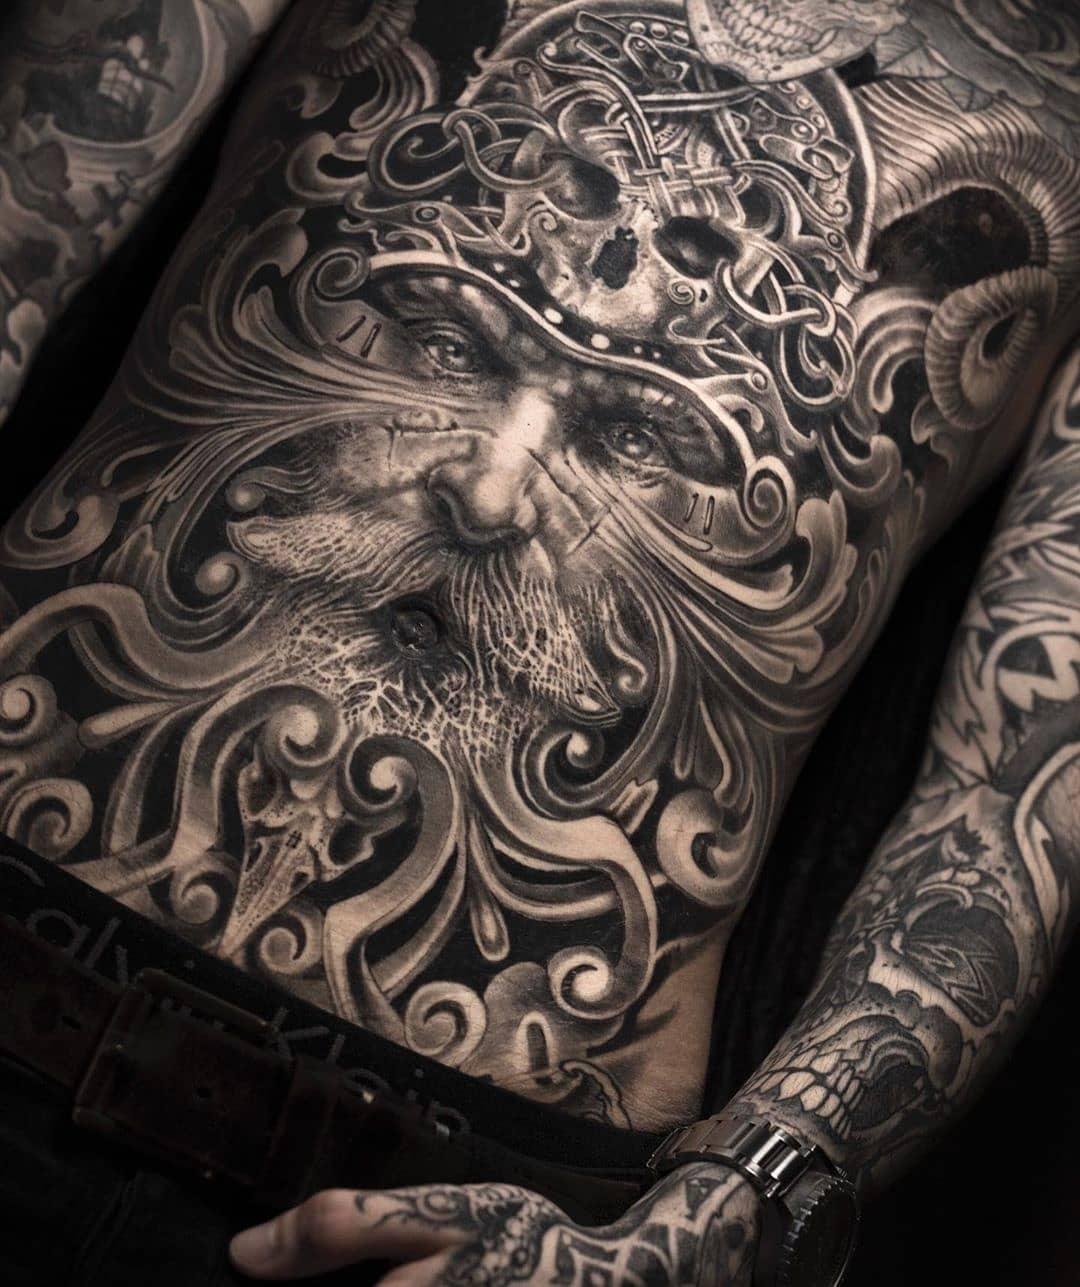 7 Potret tato ini bertema realistik, keren atau justru bikin ngeri?